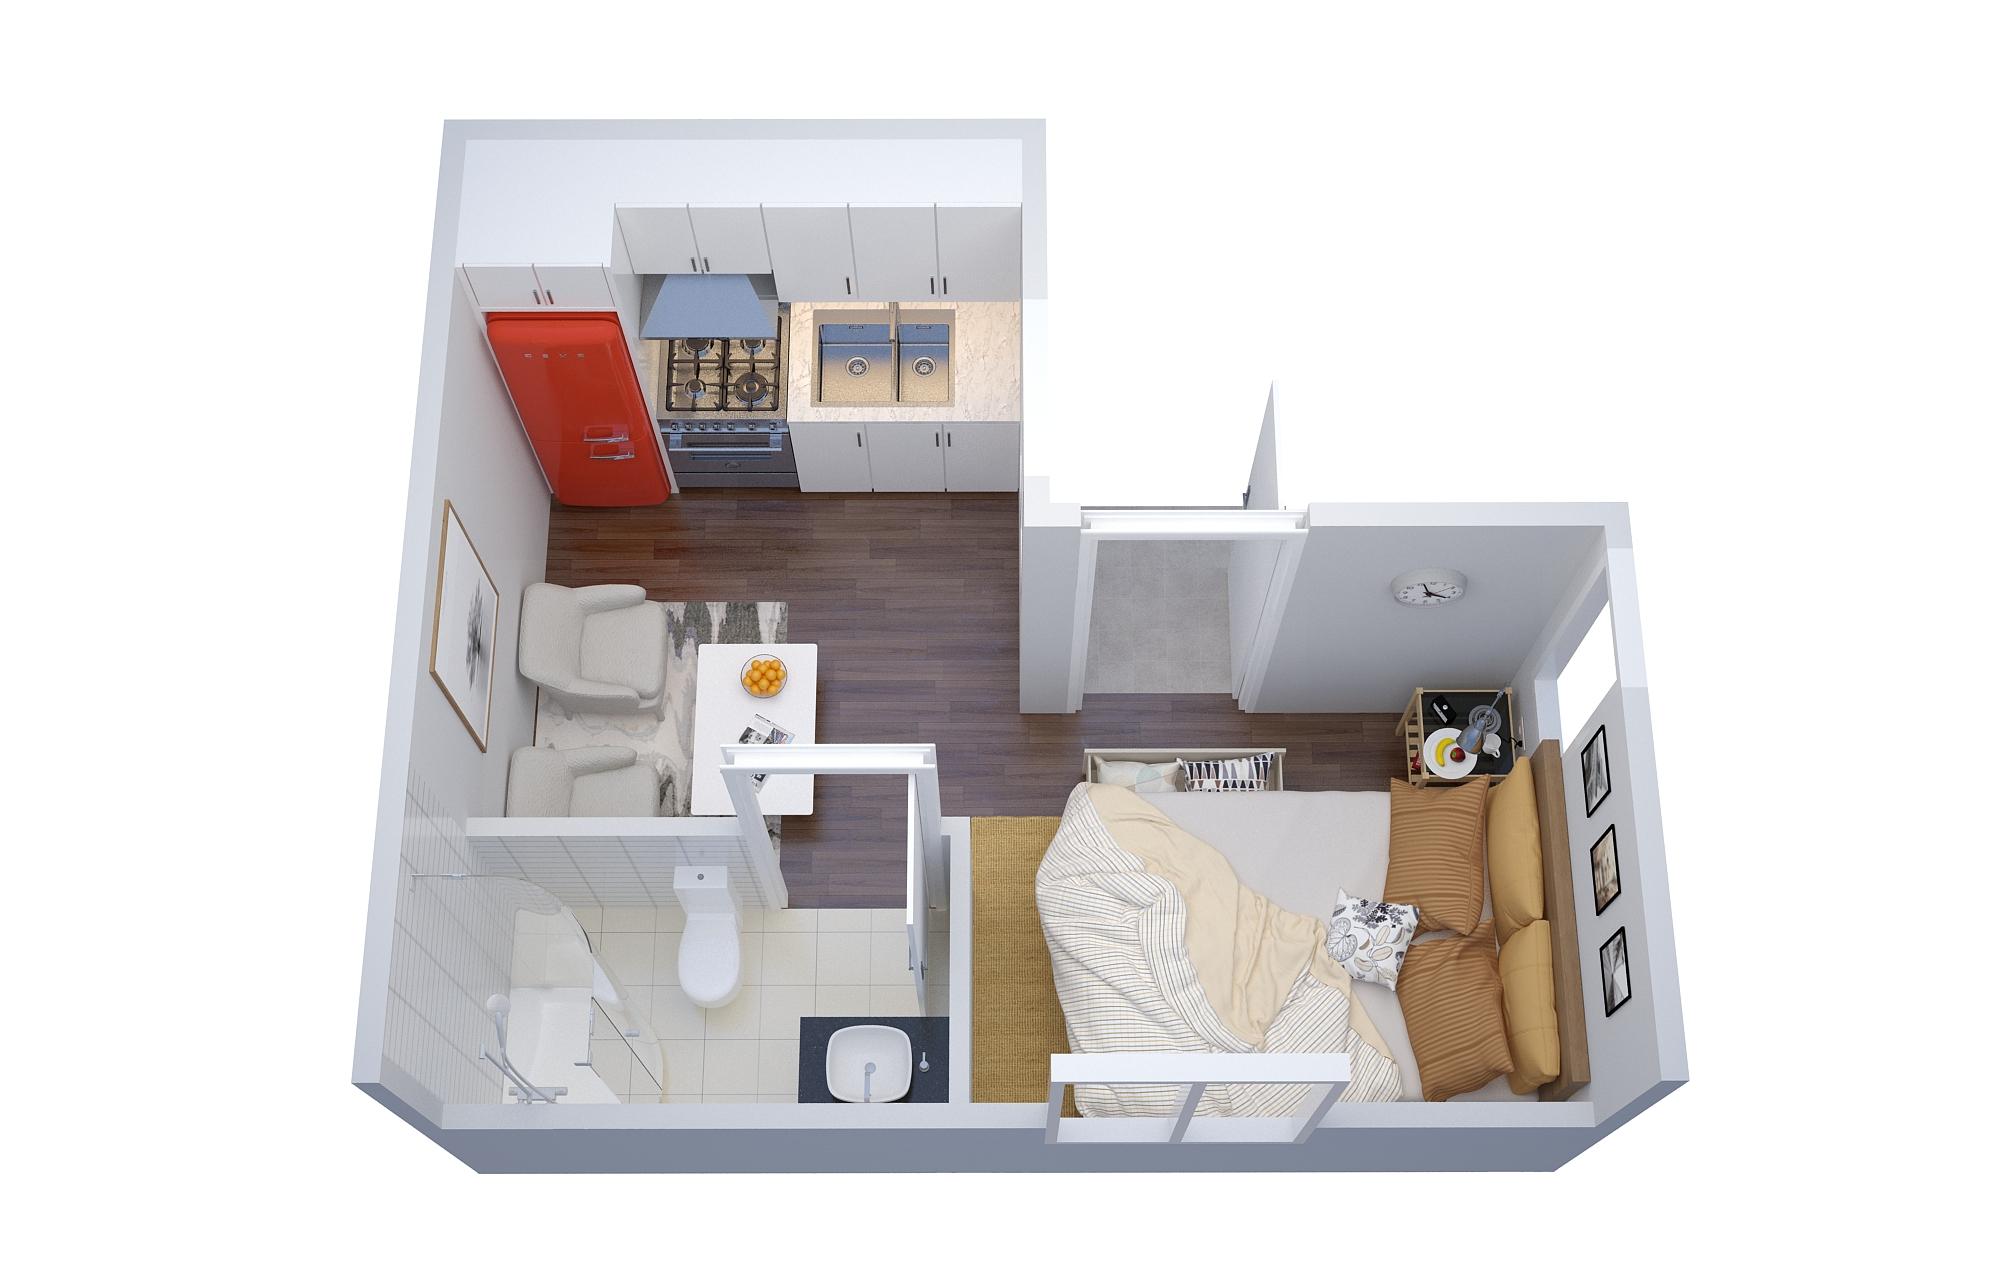 Home Studio/Office Studio